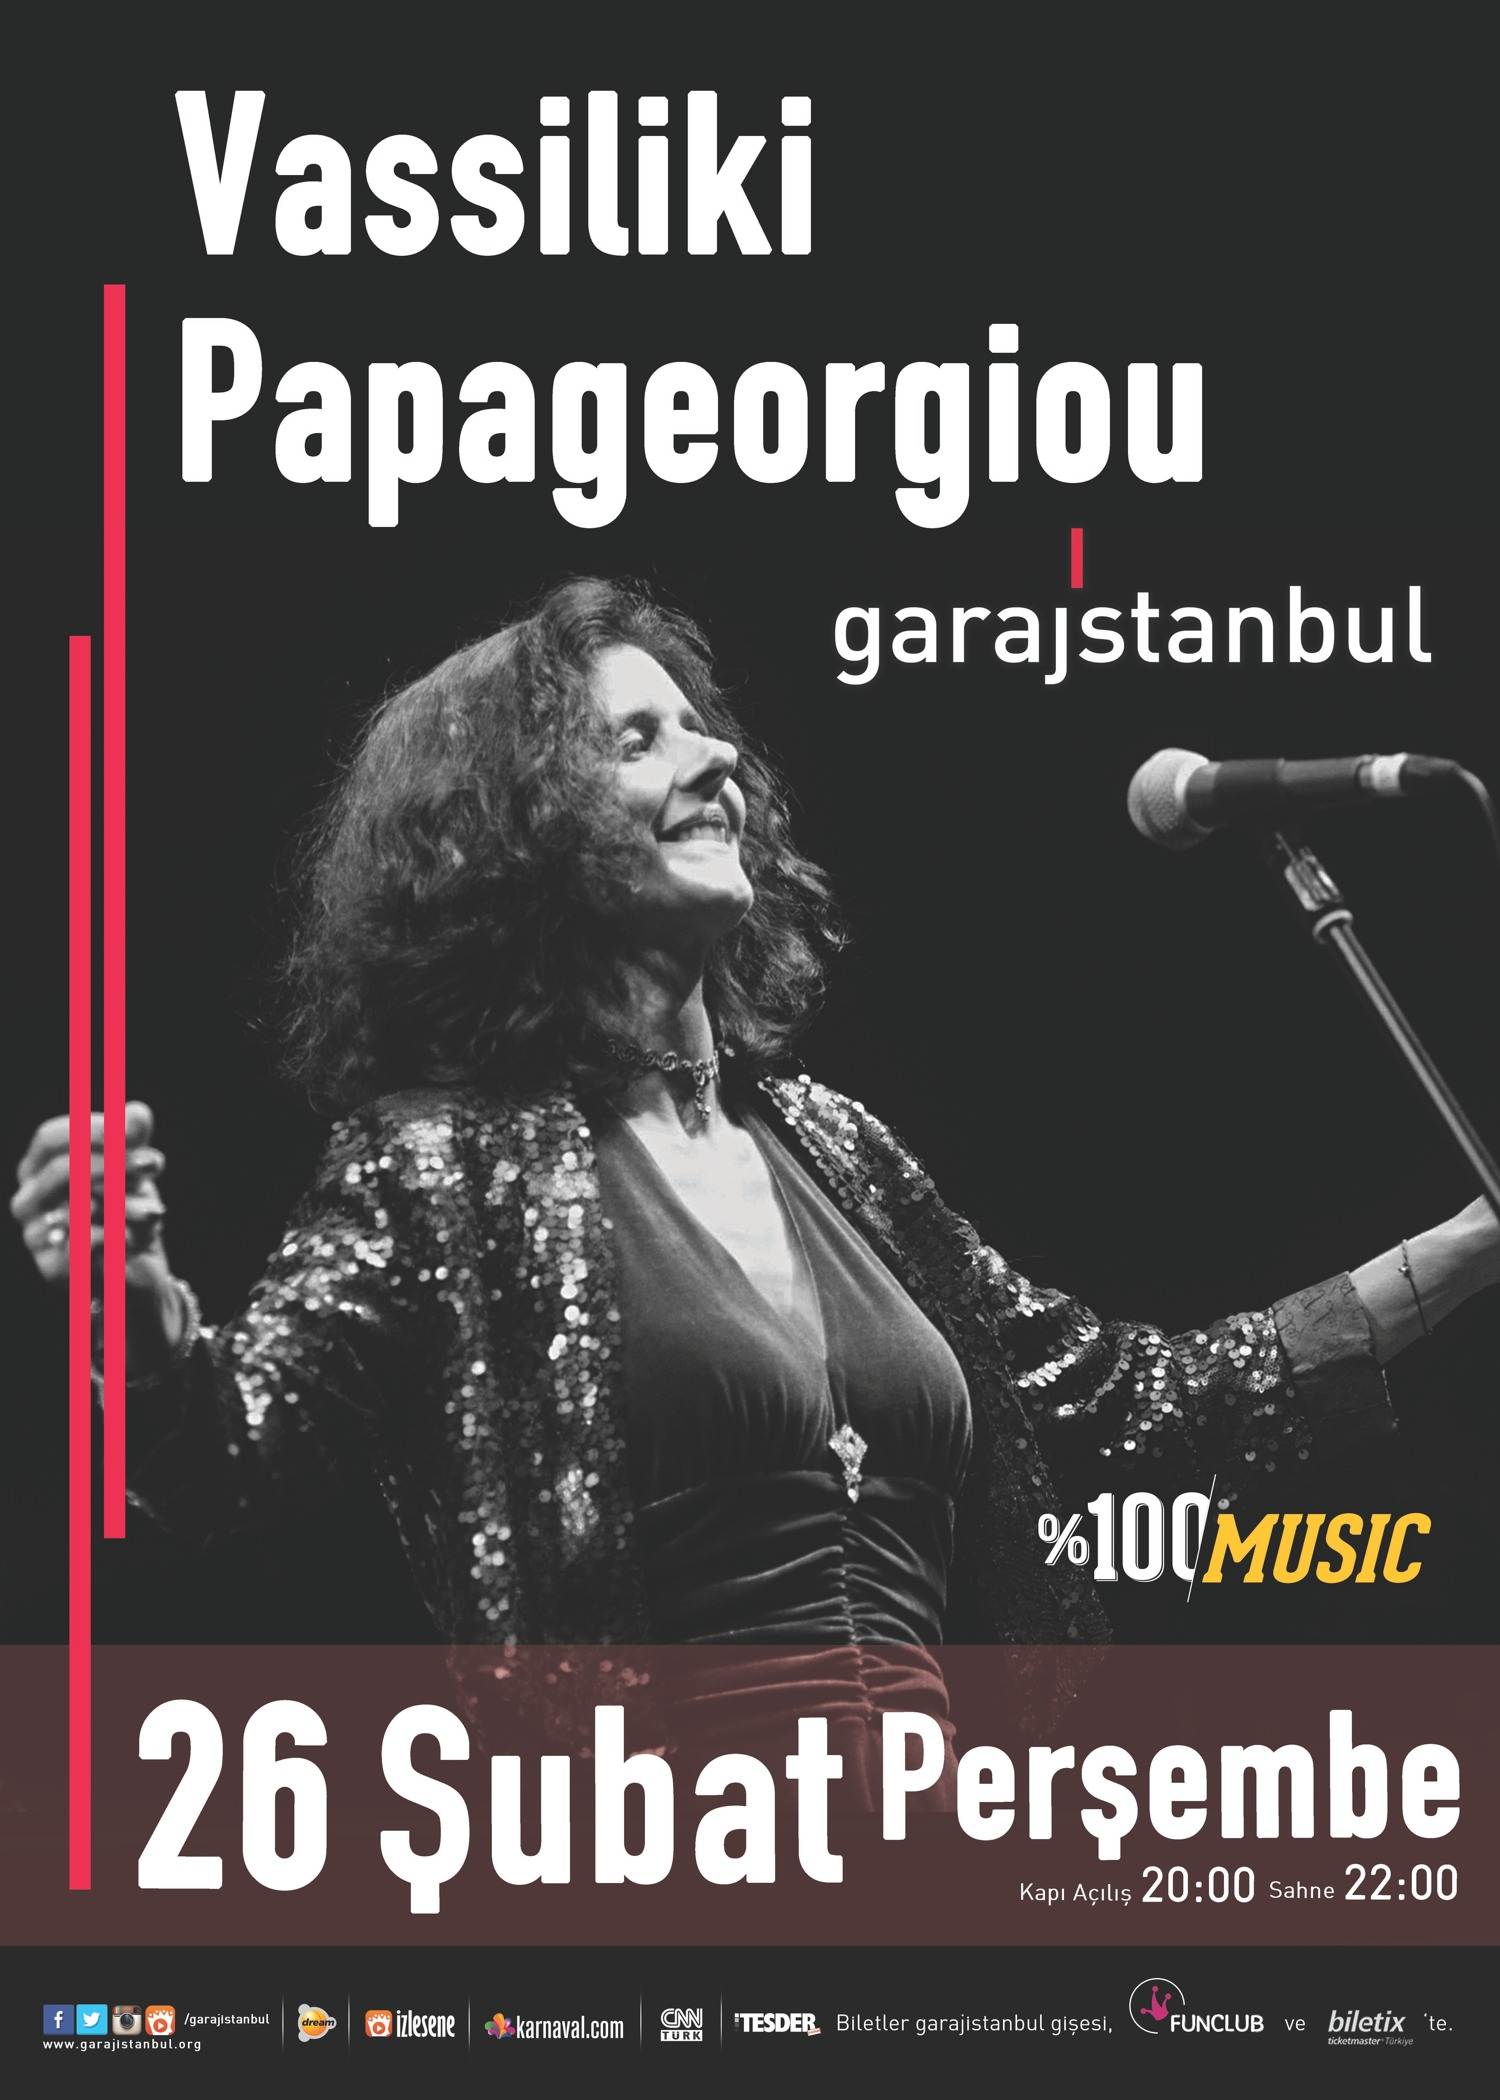 26subat-GarajIstanbul .jpg